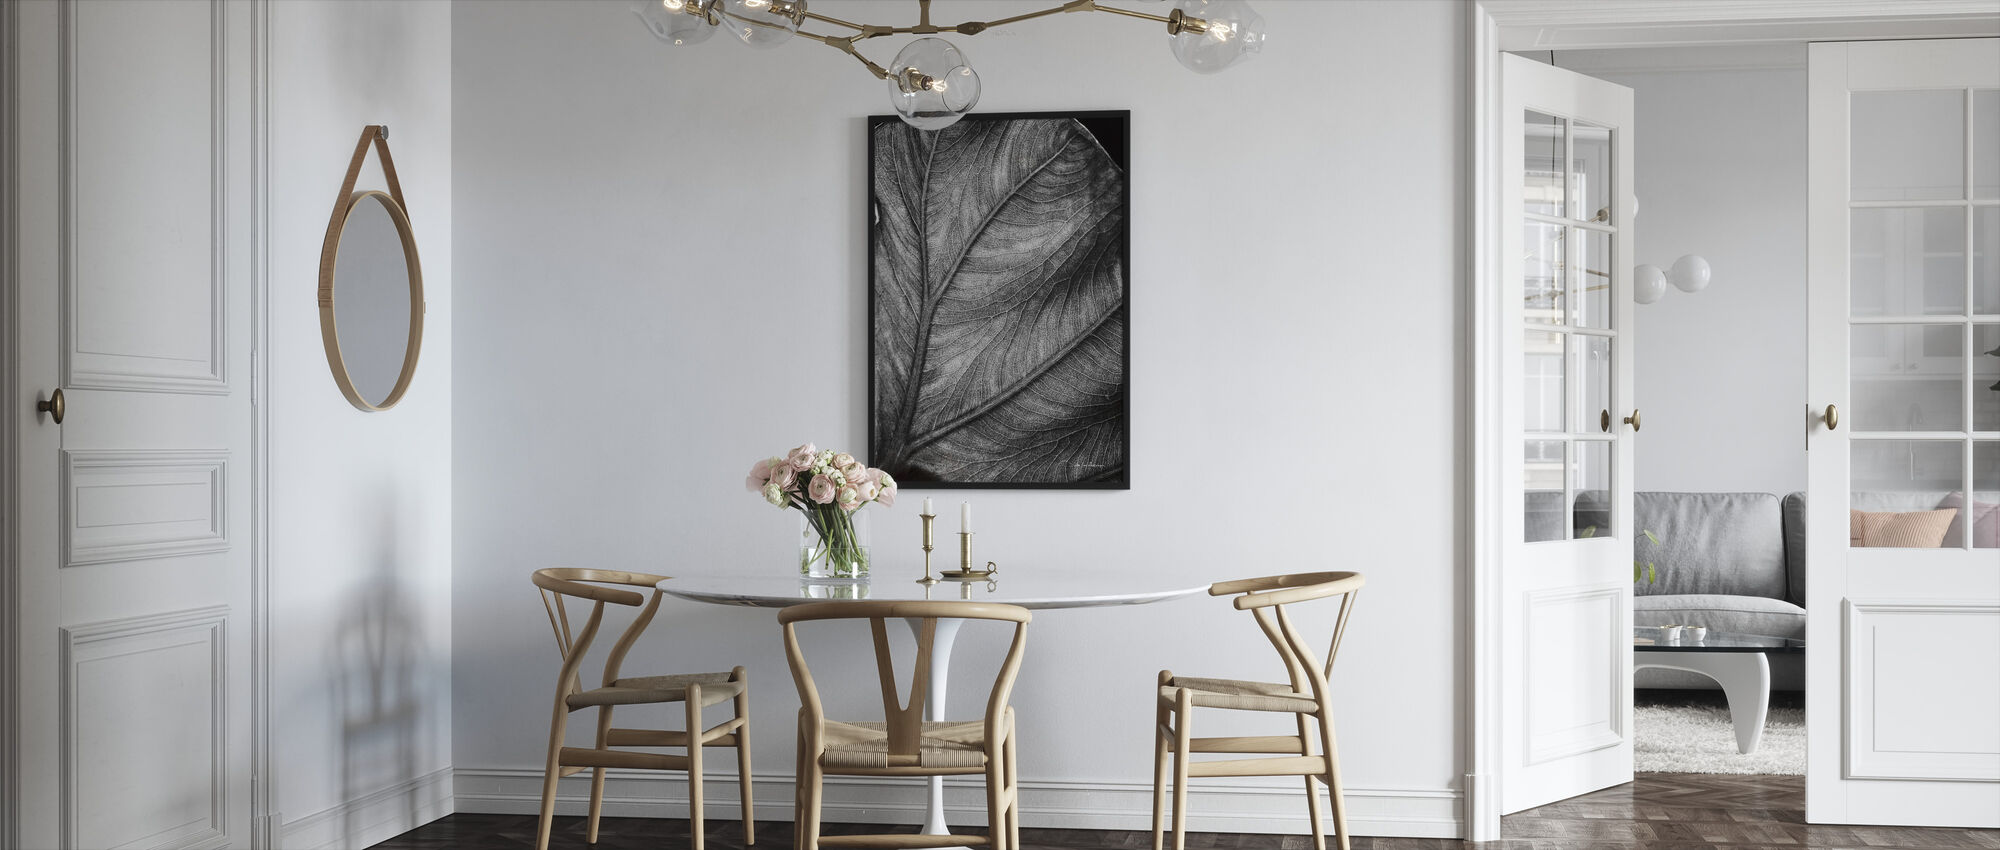 Elephant Ear - Framed print - Kitchen